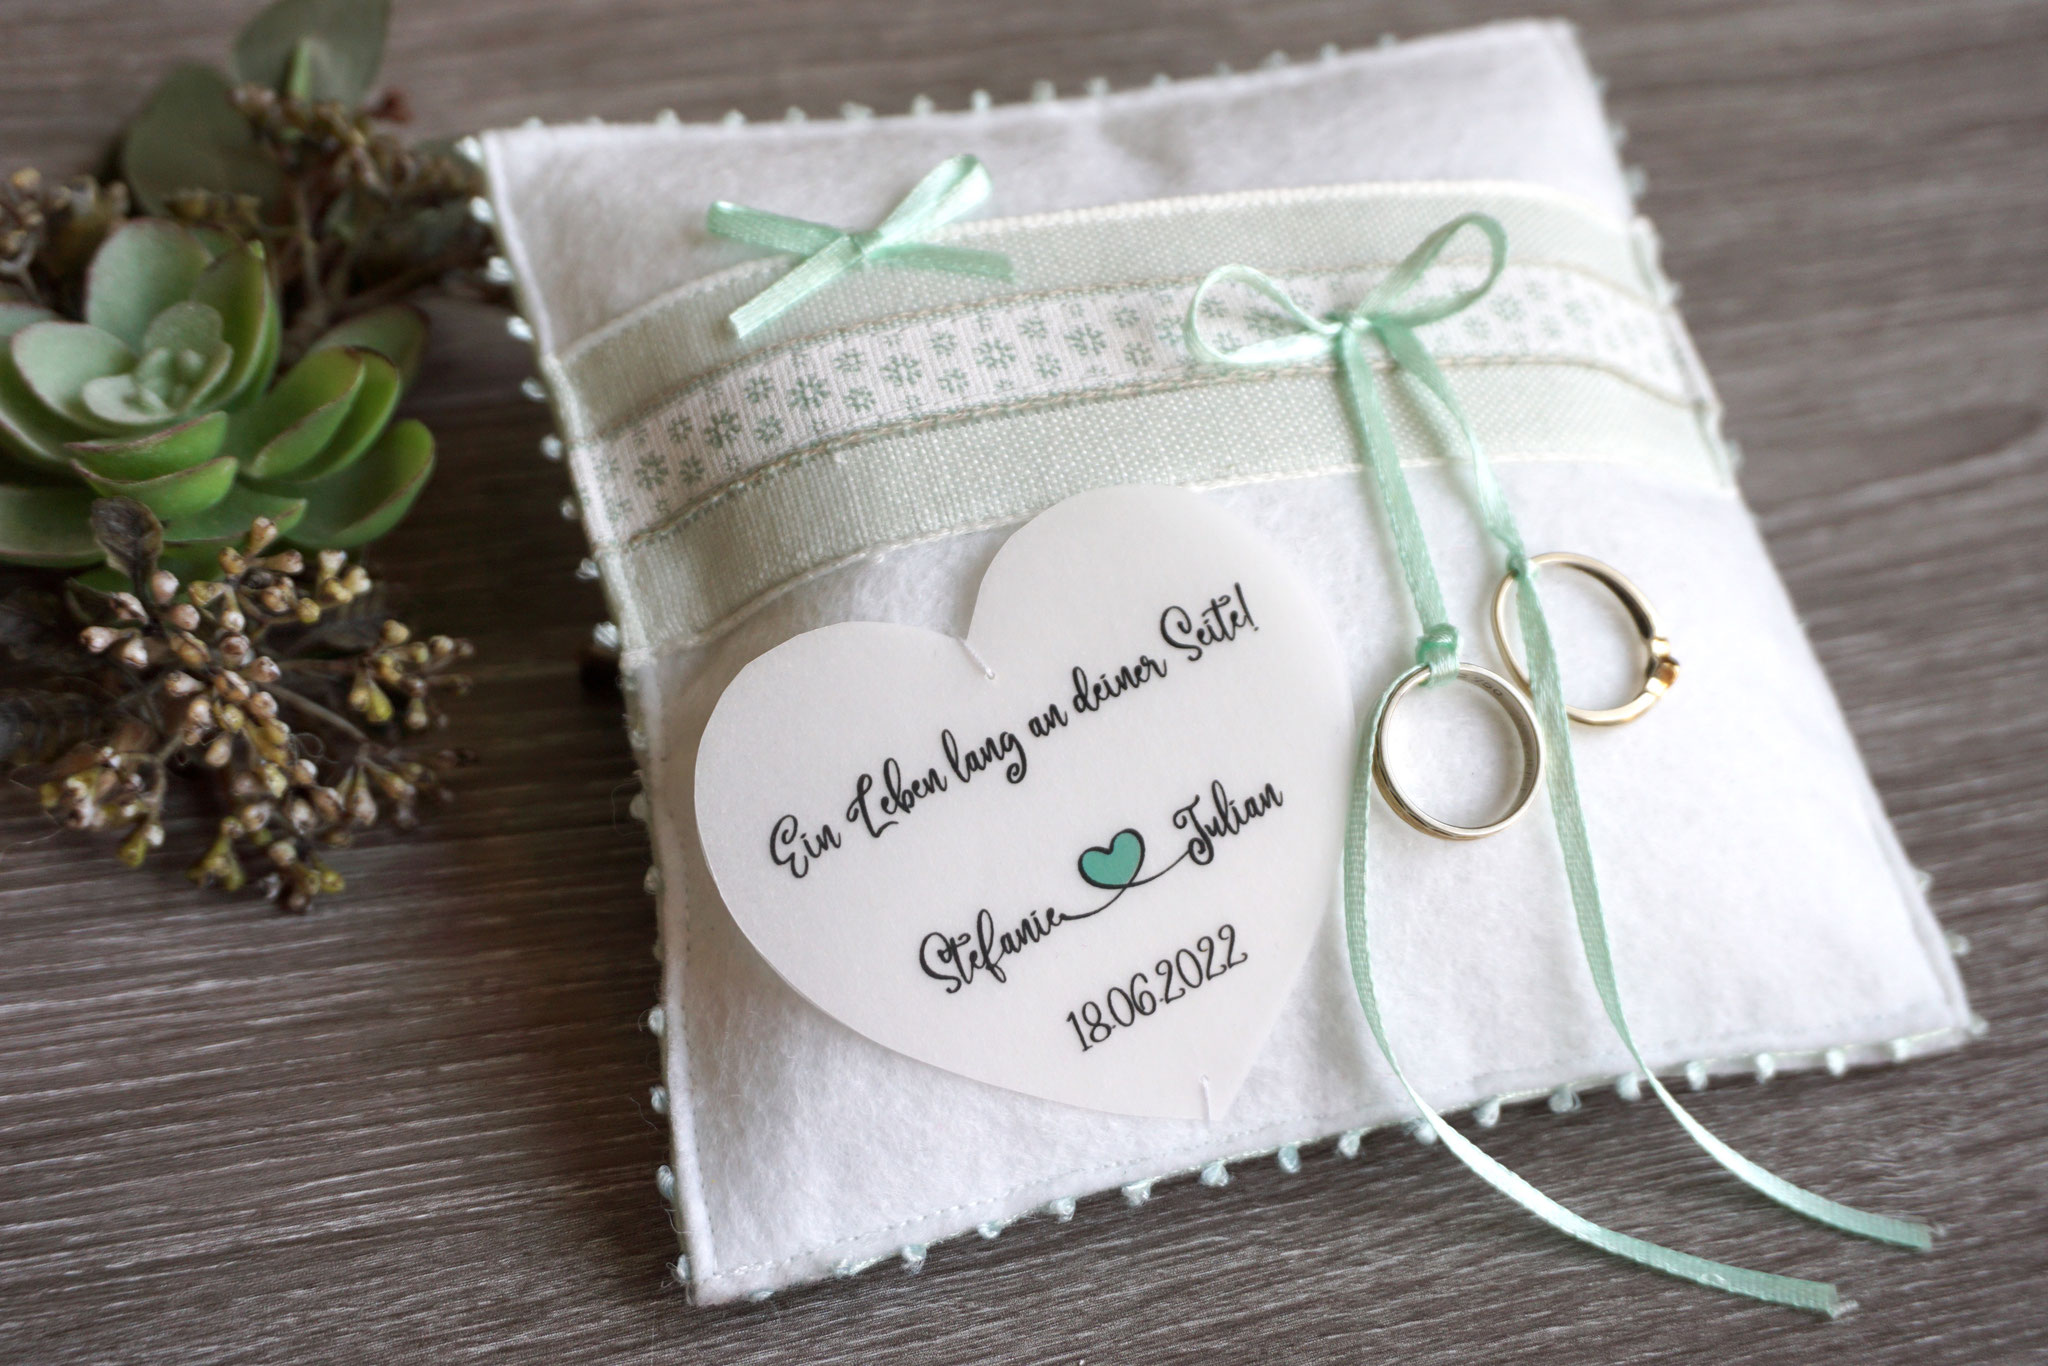 Ringkissen Chantal mit Beschriftung aus Pergamentpapier-Herz